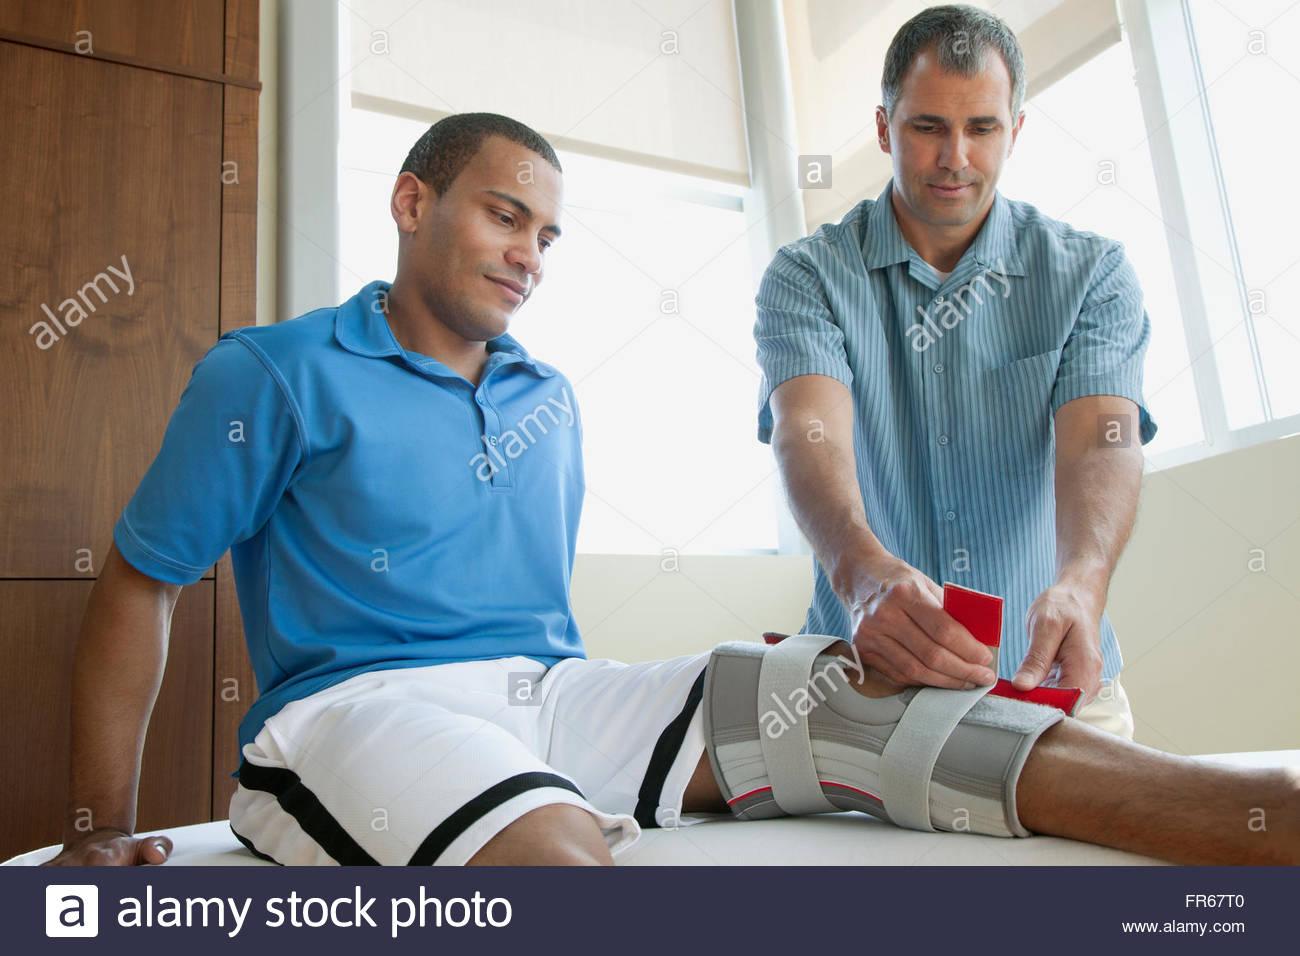 doctor applying brace to patients knee - Stock Image